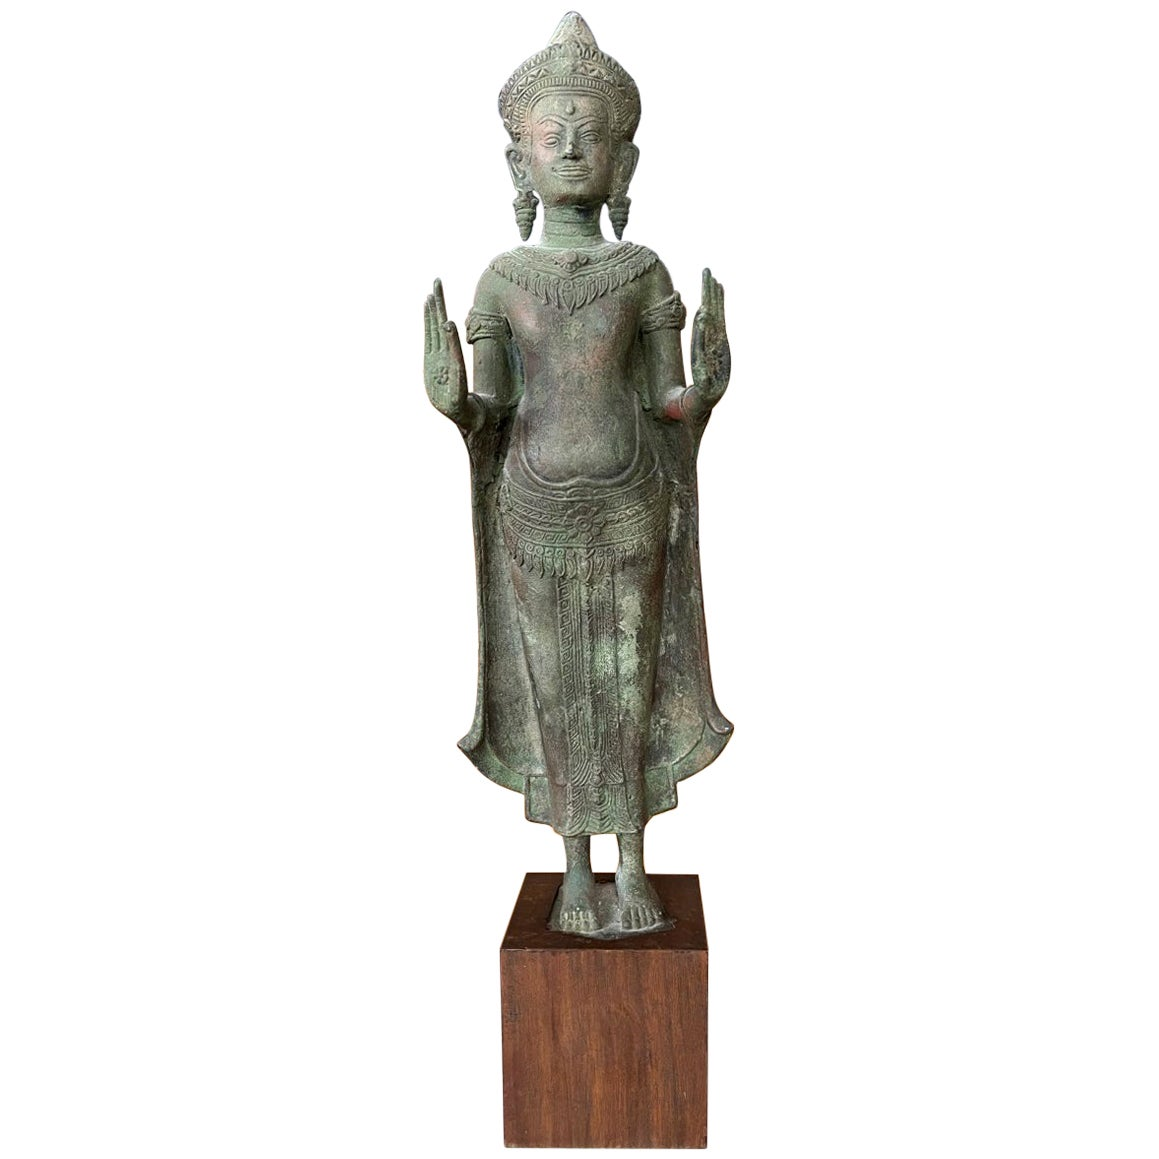 Antique Lopburi Buddha Statue from Thailand